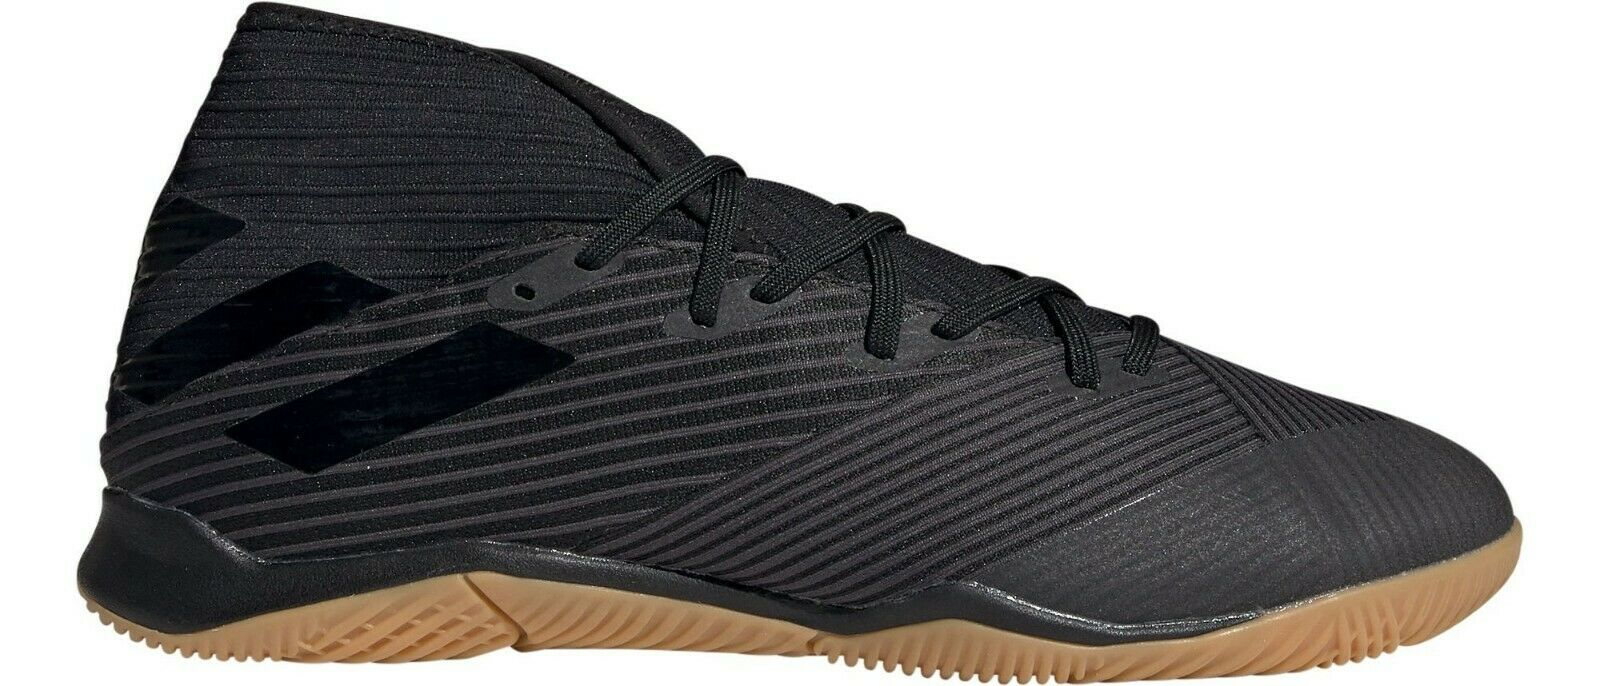 Adidas Men's NEMEZIZ 19.3 Indoor Soccer Shoes Black F34413 d